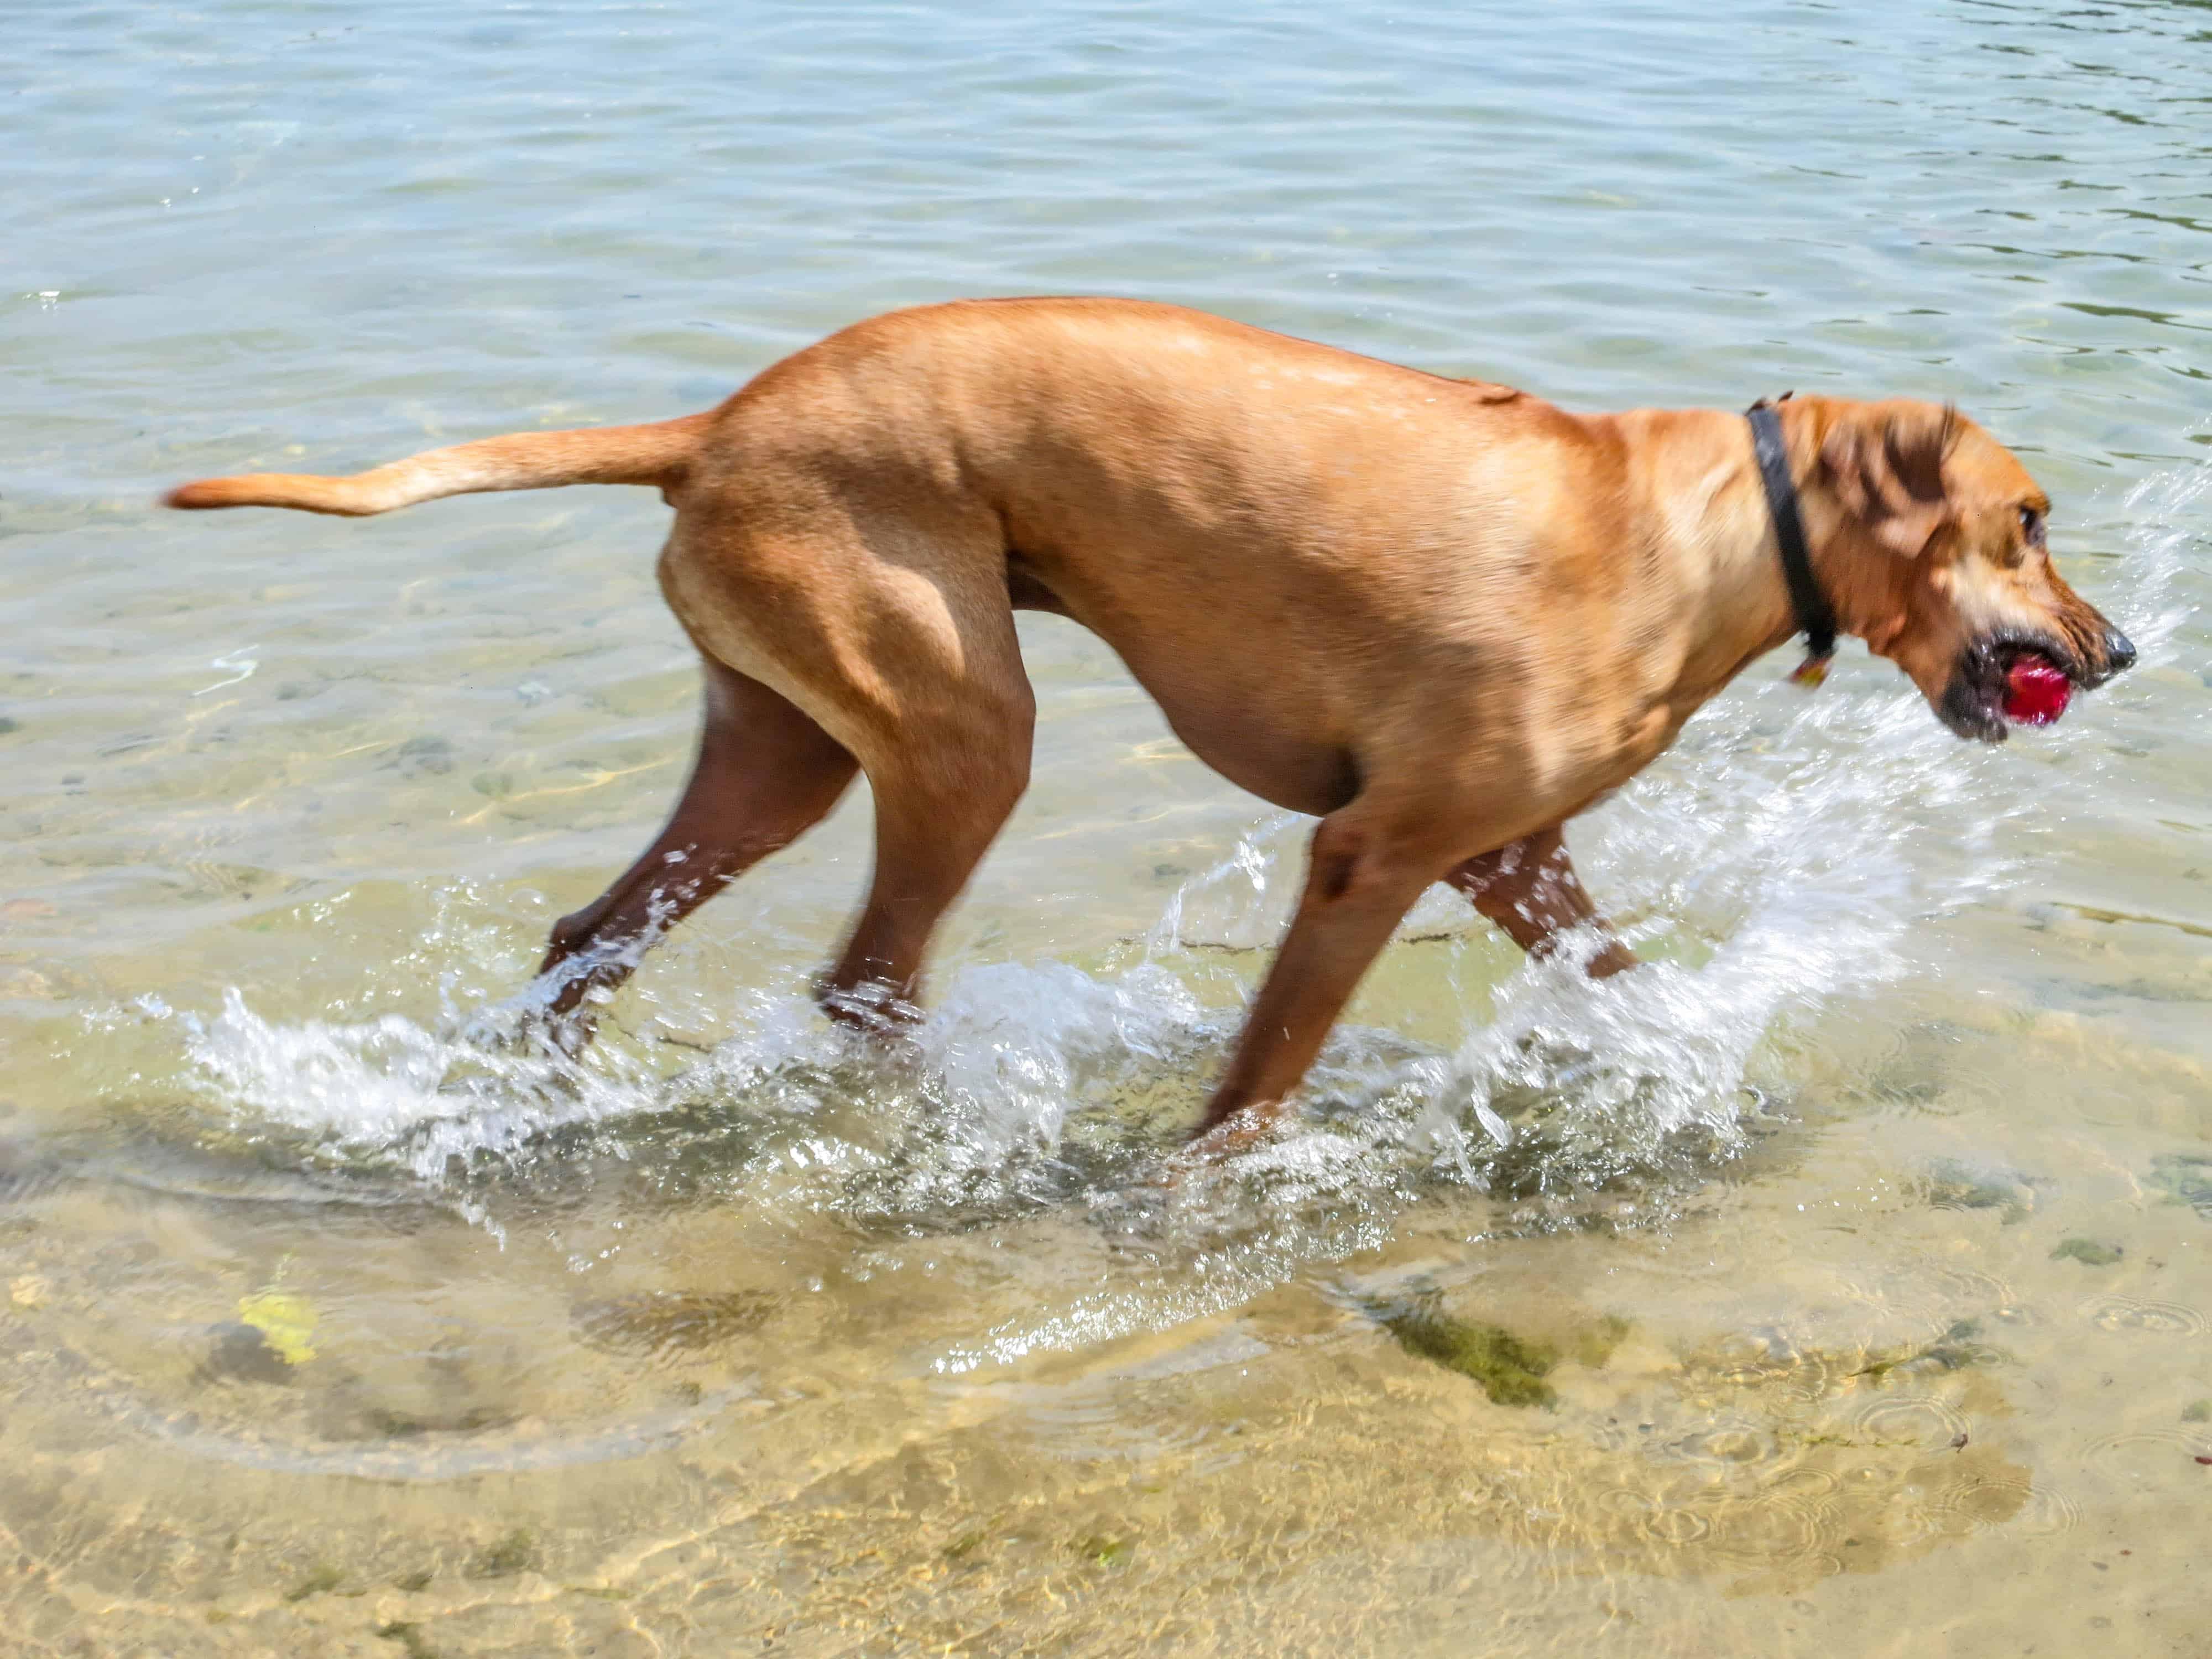 Rhodesian Ridgeback, Rhodesian Ridgeback photos, dog adventure, marking our territory, dog blog, petcentric